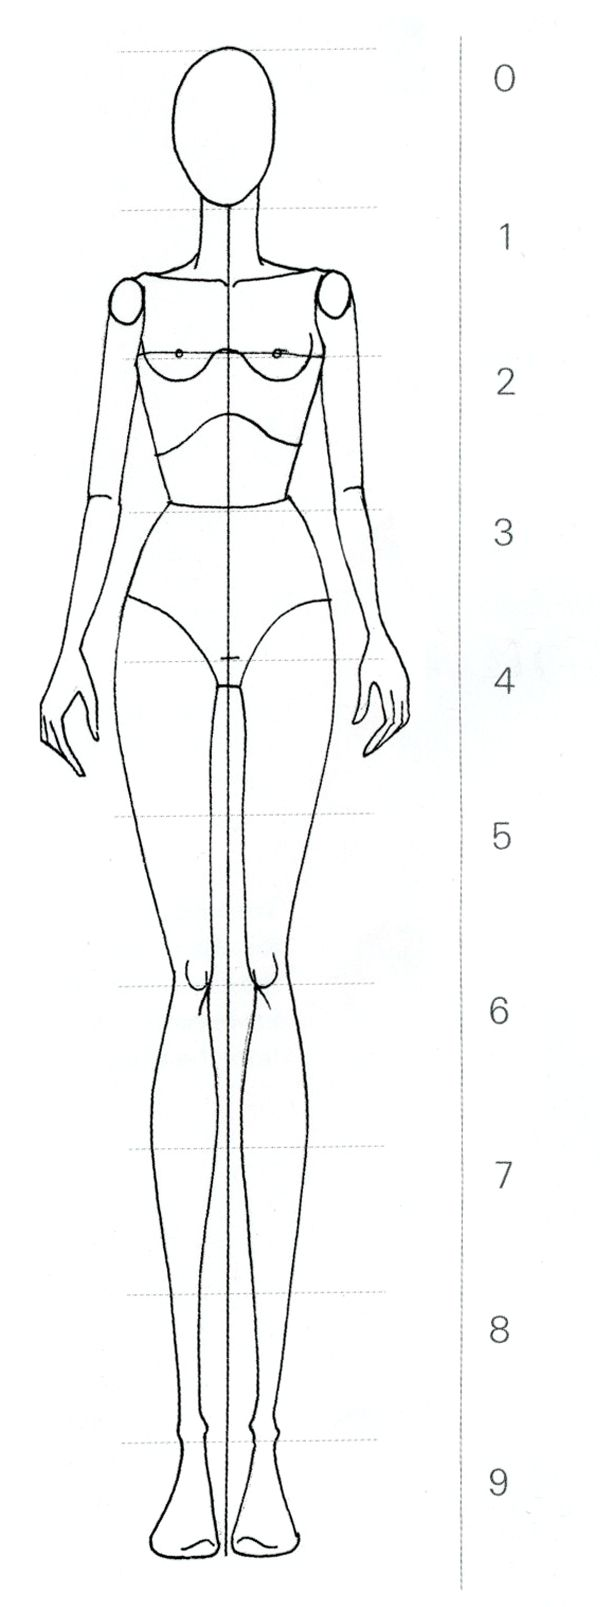 Drawing  The Nine Head Fashion Croquis  Fashion Finishing School